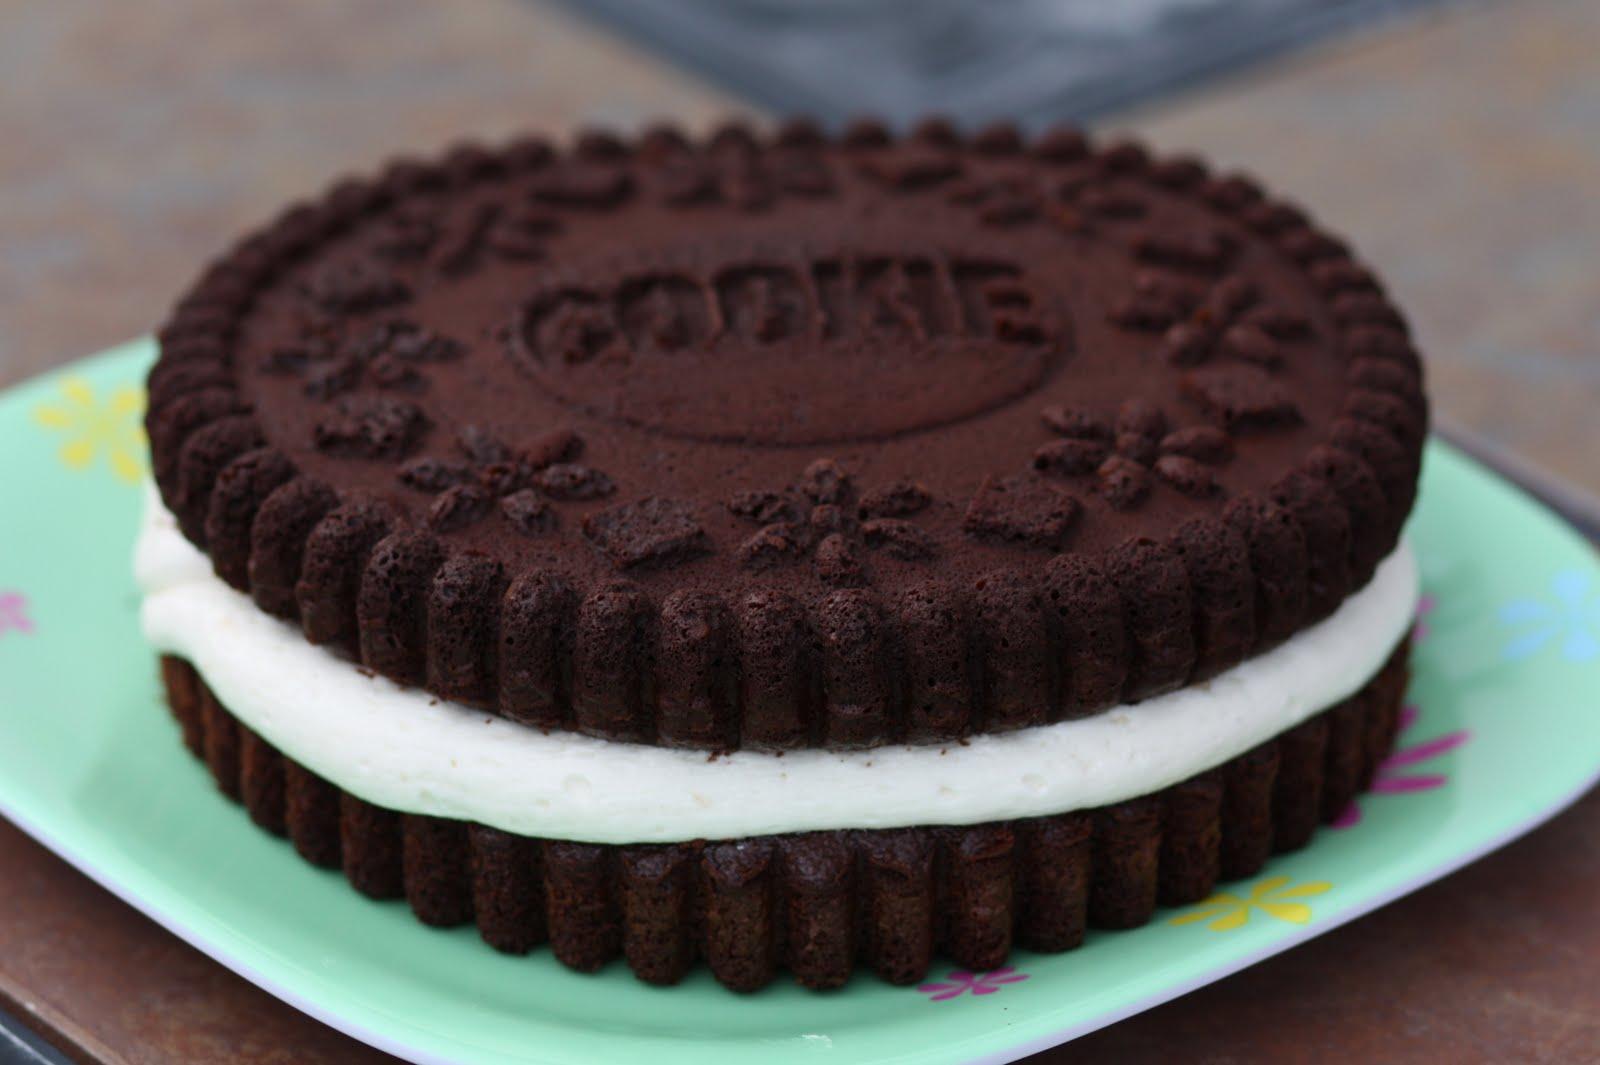 cookie cake oreo cookie cake filling oreo cookie oreo cookie cake